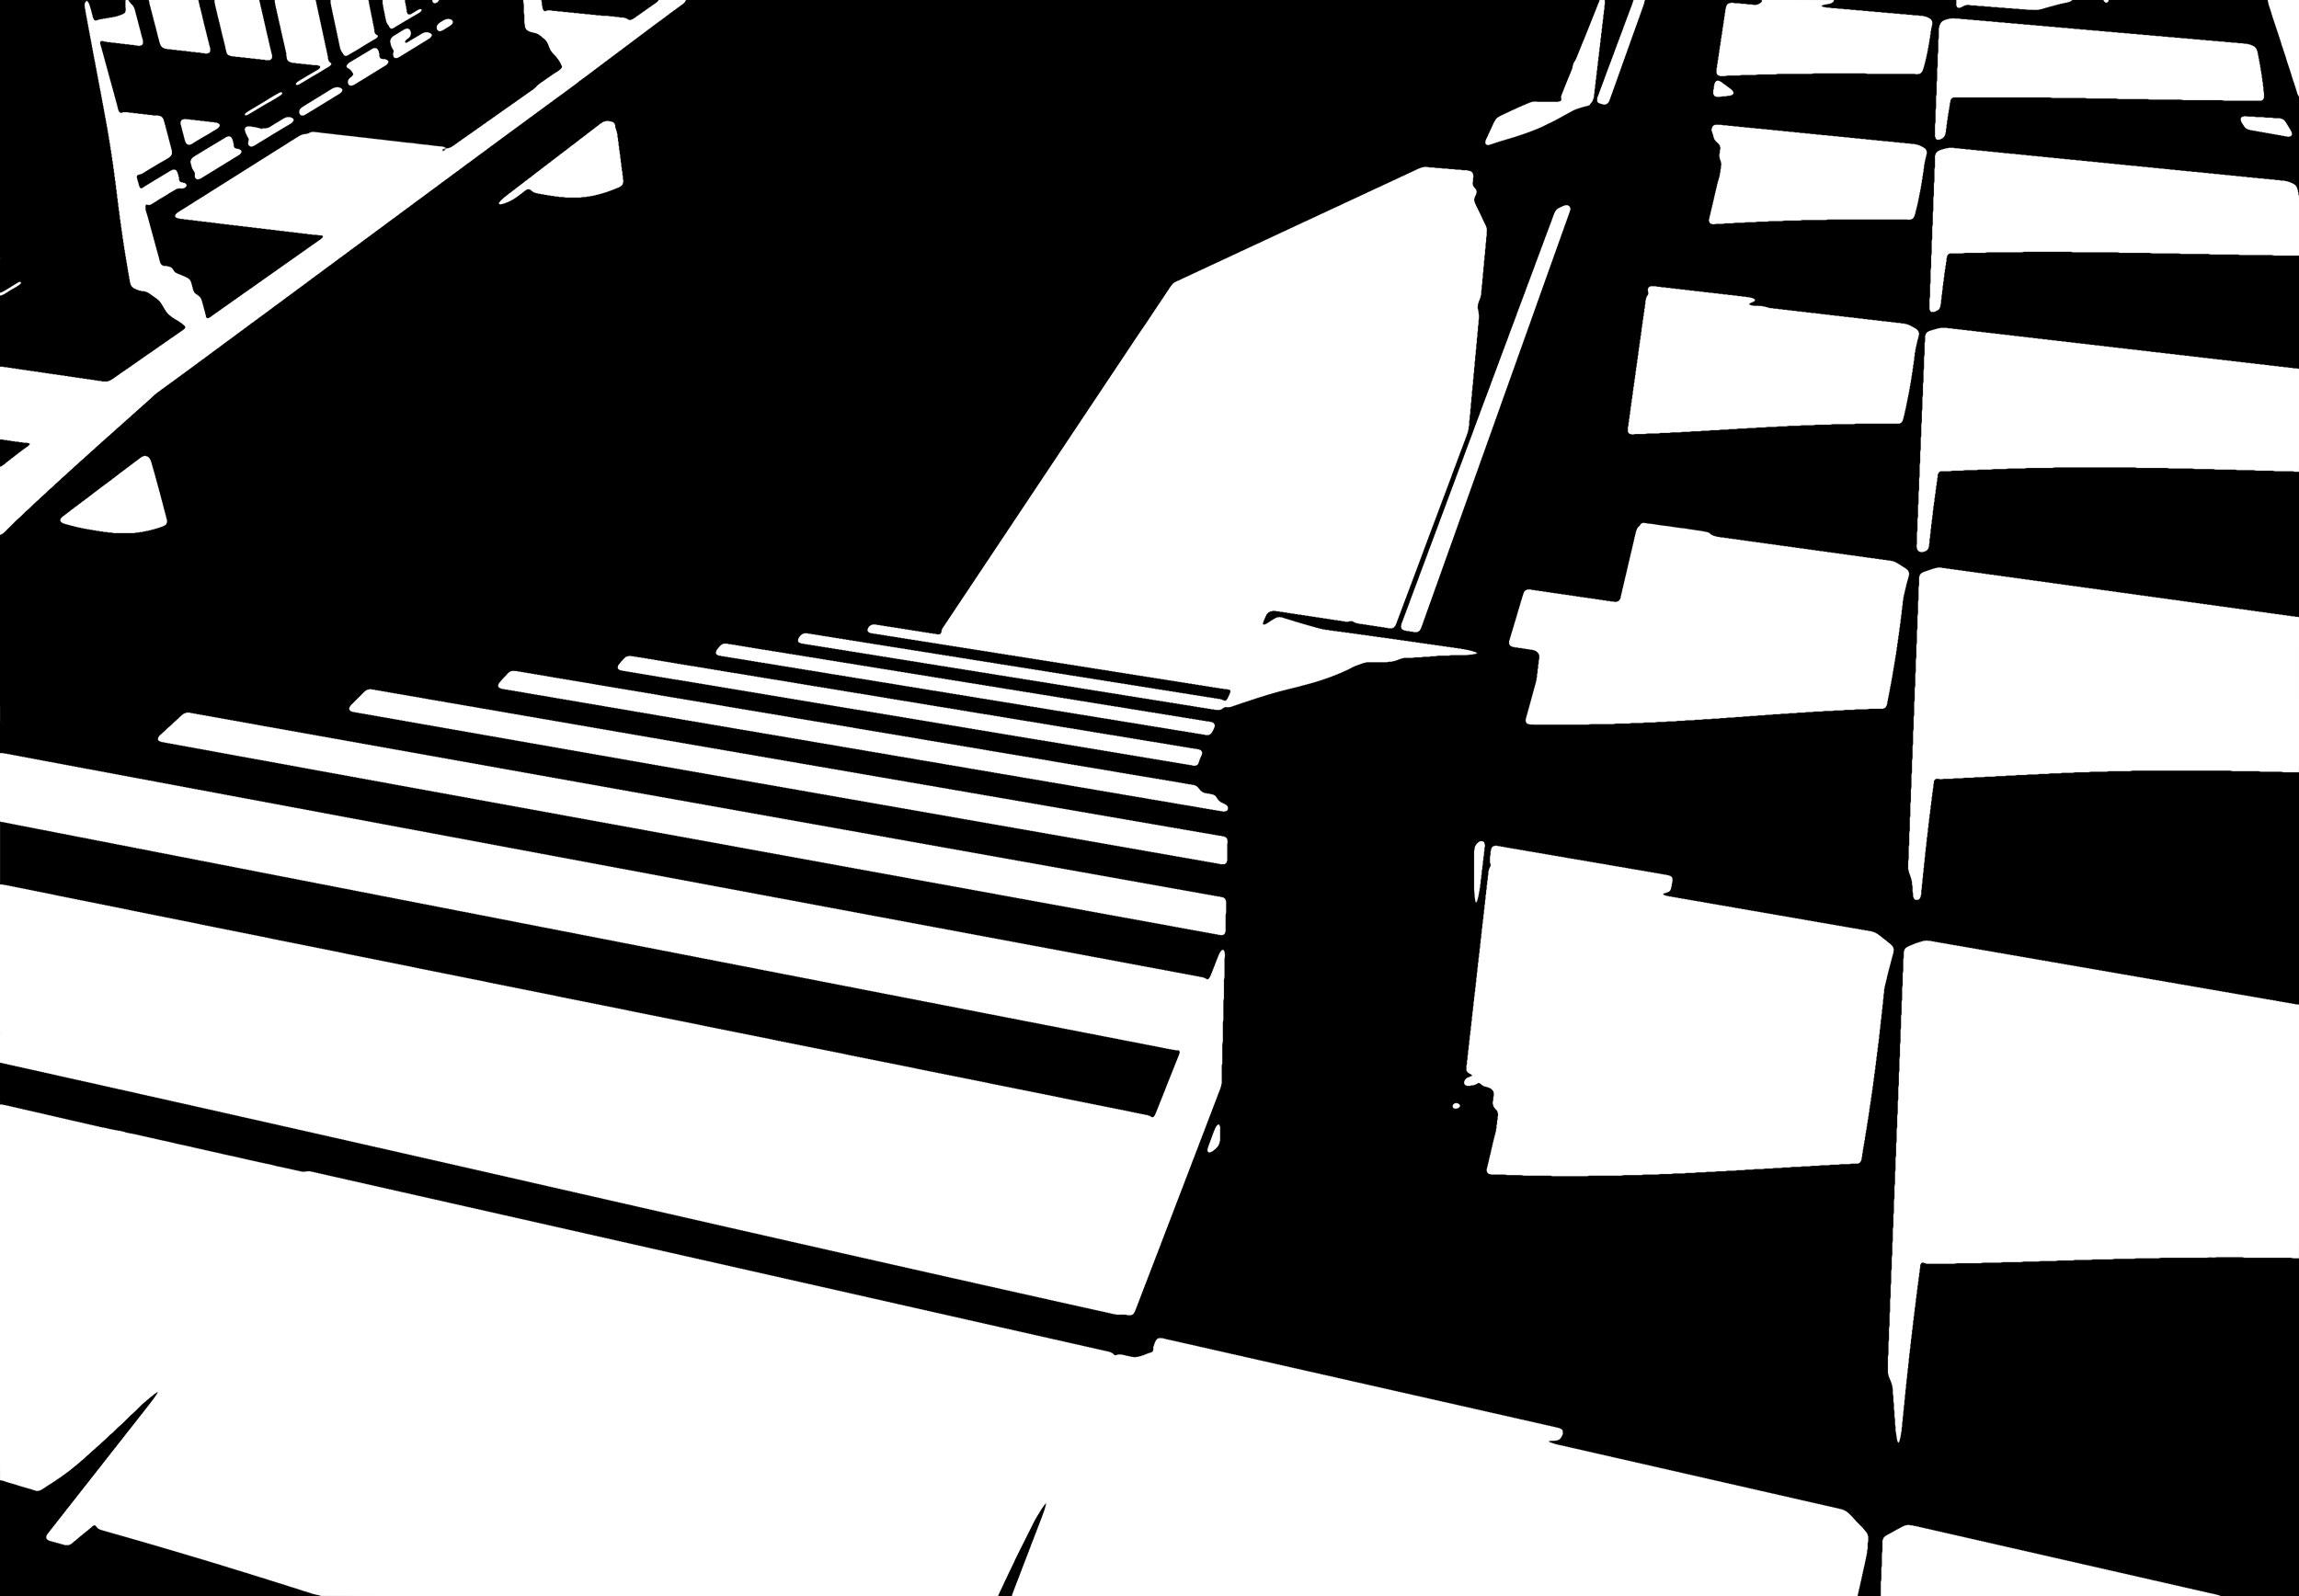 City_Street2_Stairs.jpg